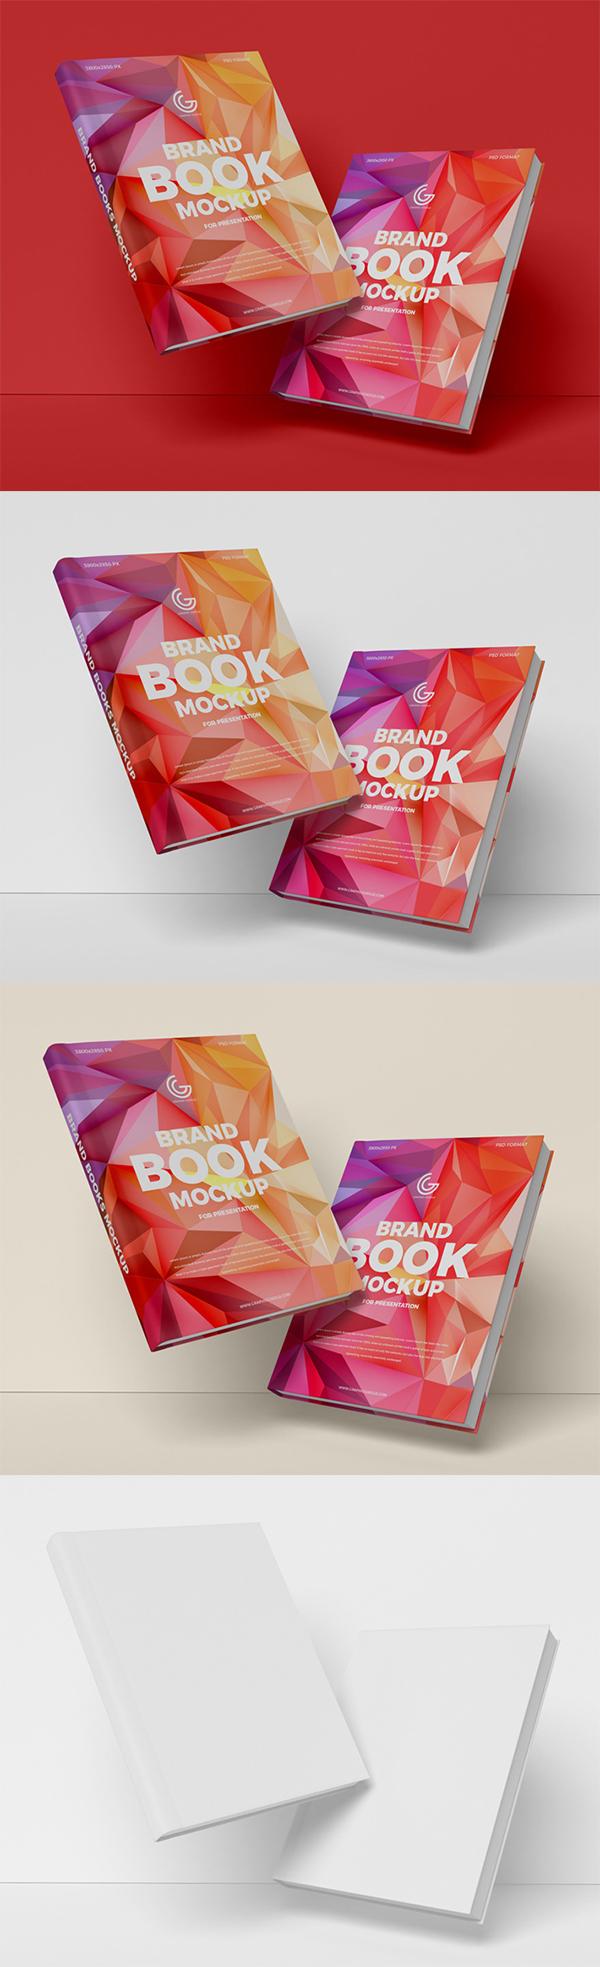 Free Download Creative Brand Books PSD Mockup (2019)